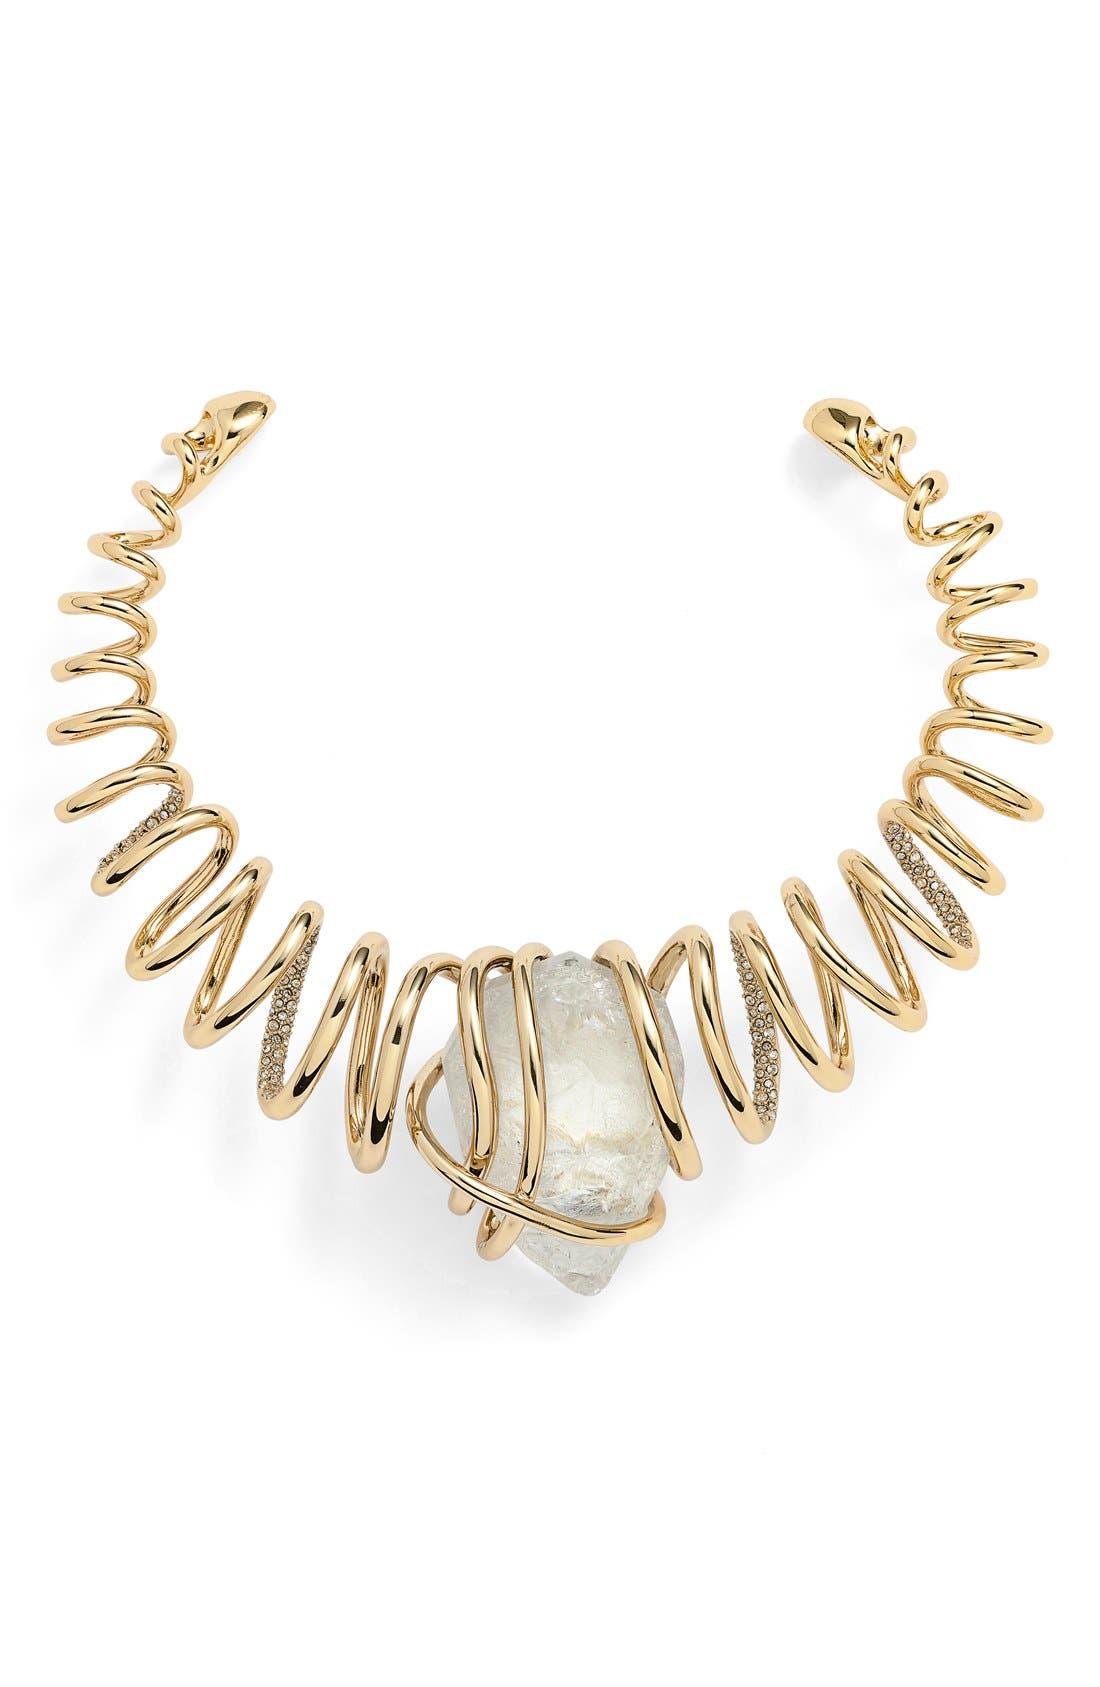 Main Image - Alexis Bittar 'Miss Havisham' Encrusted Spiral Collar Necklace